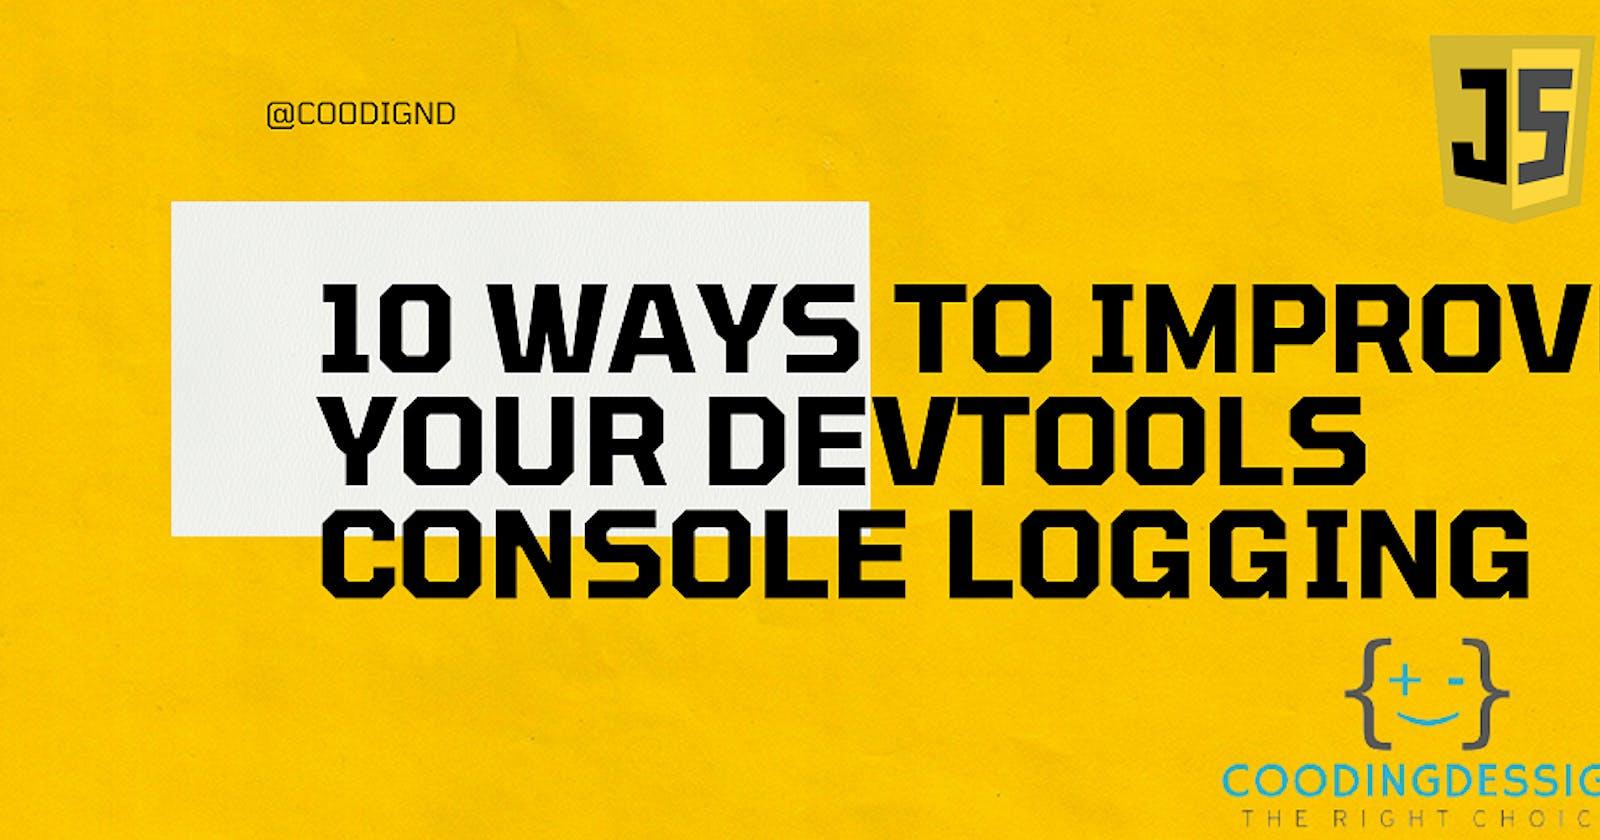 10 Ways to Improve Your DevTools Console Logging